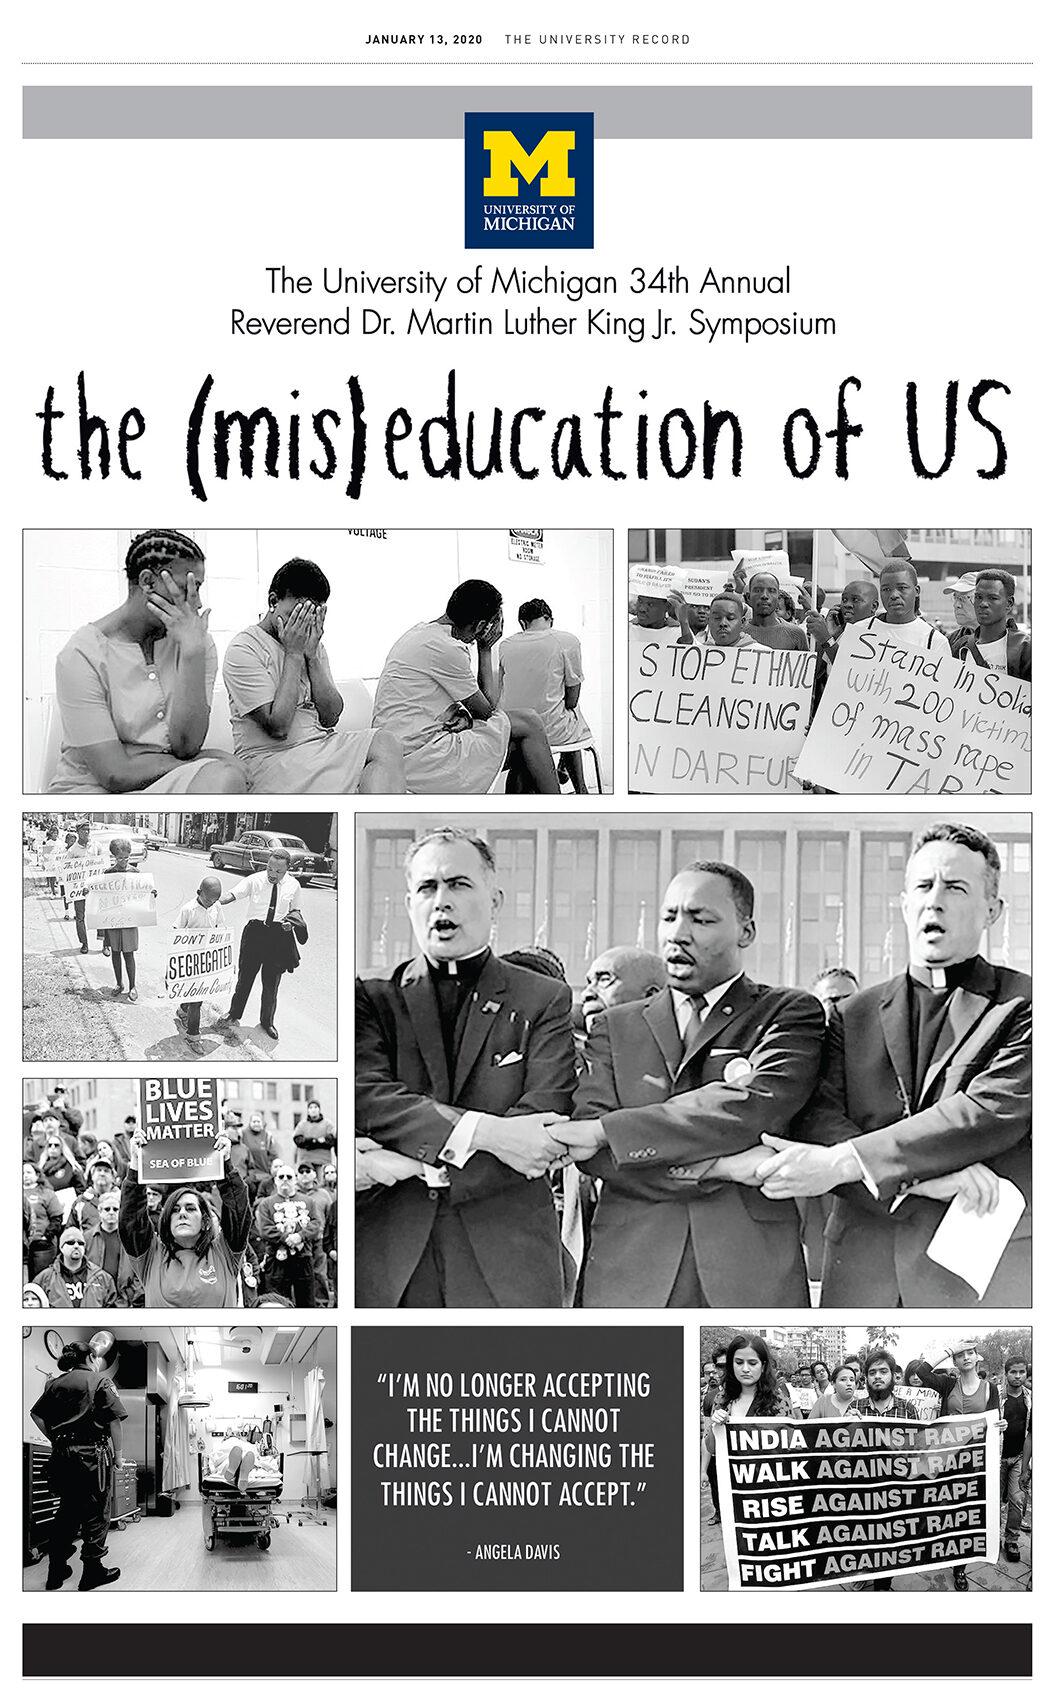 2020 Rev. Dr. Martin Luther King Jr. Symposium |  The University Record